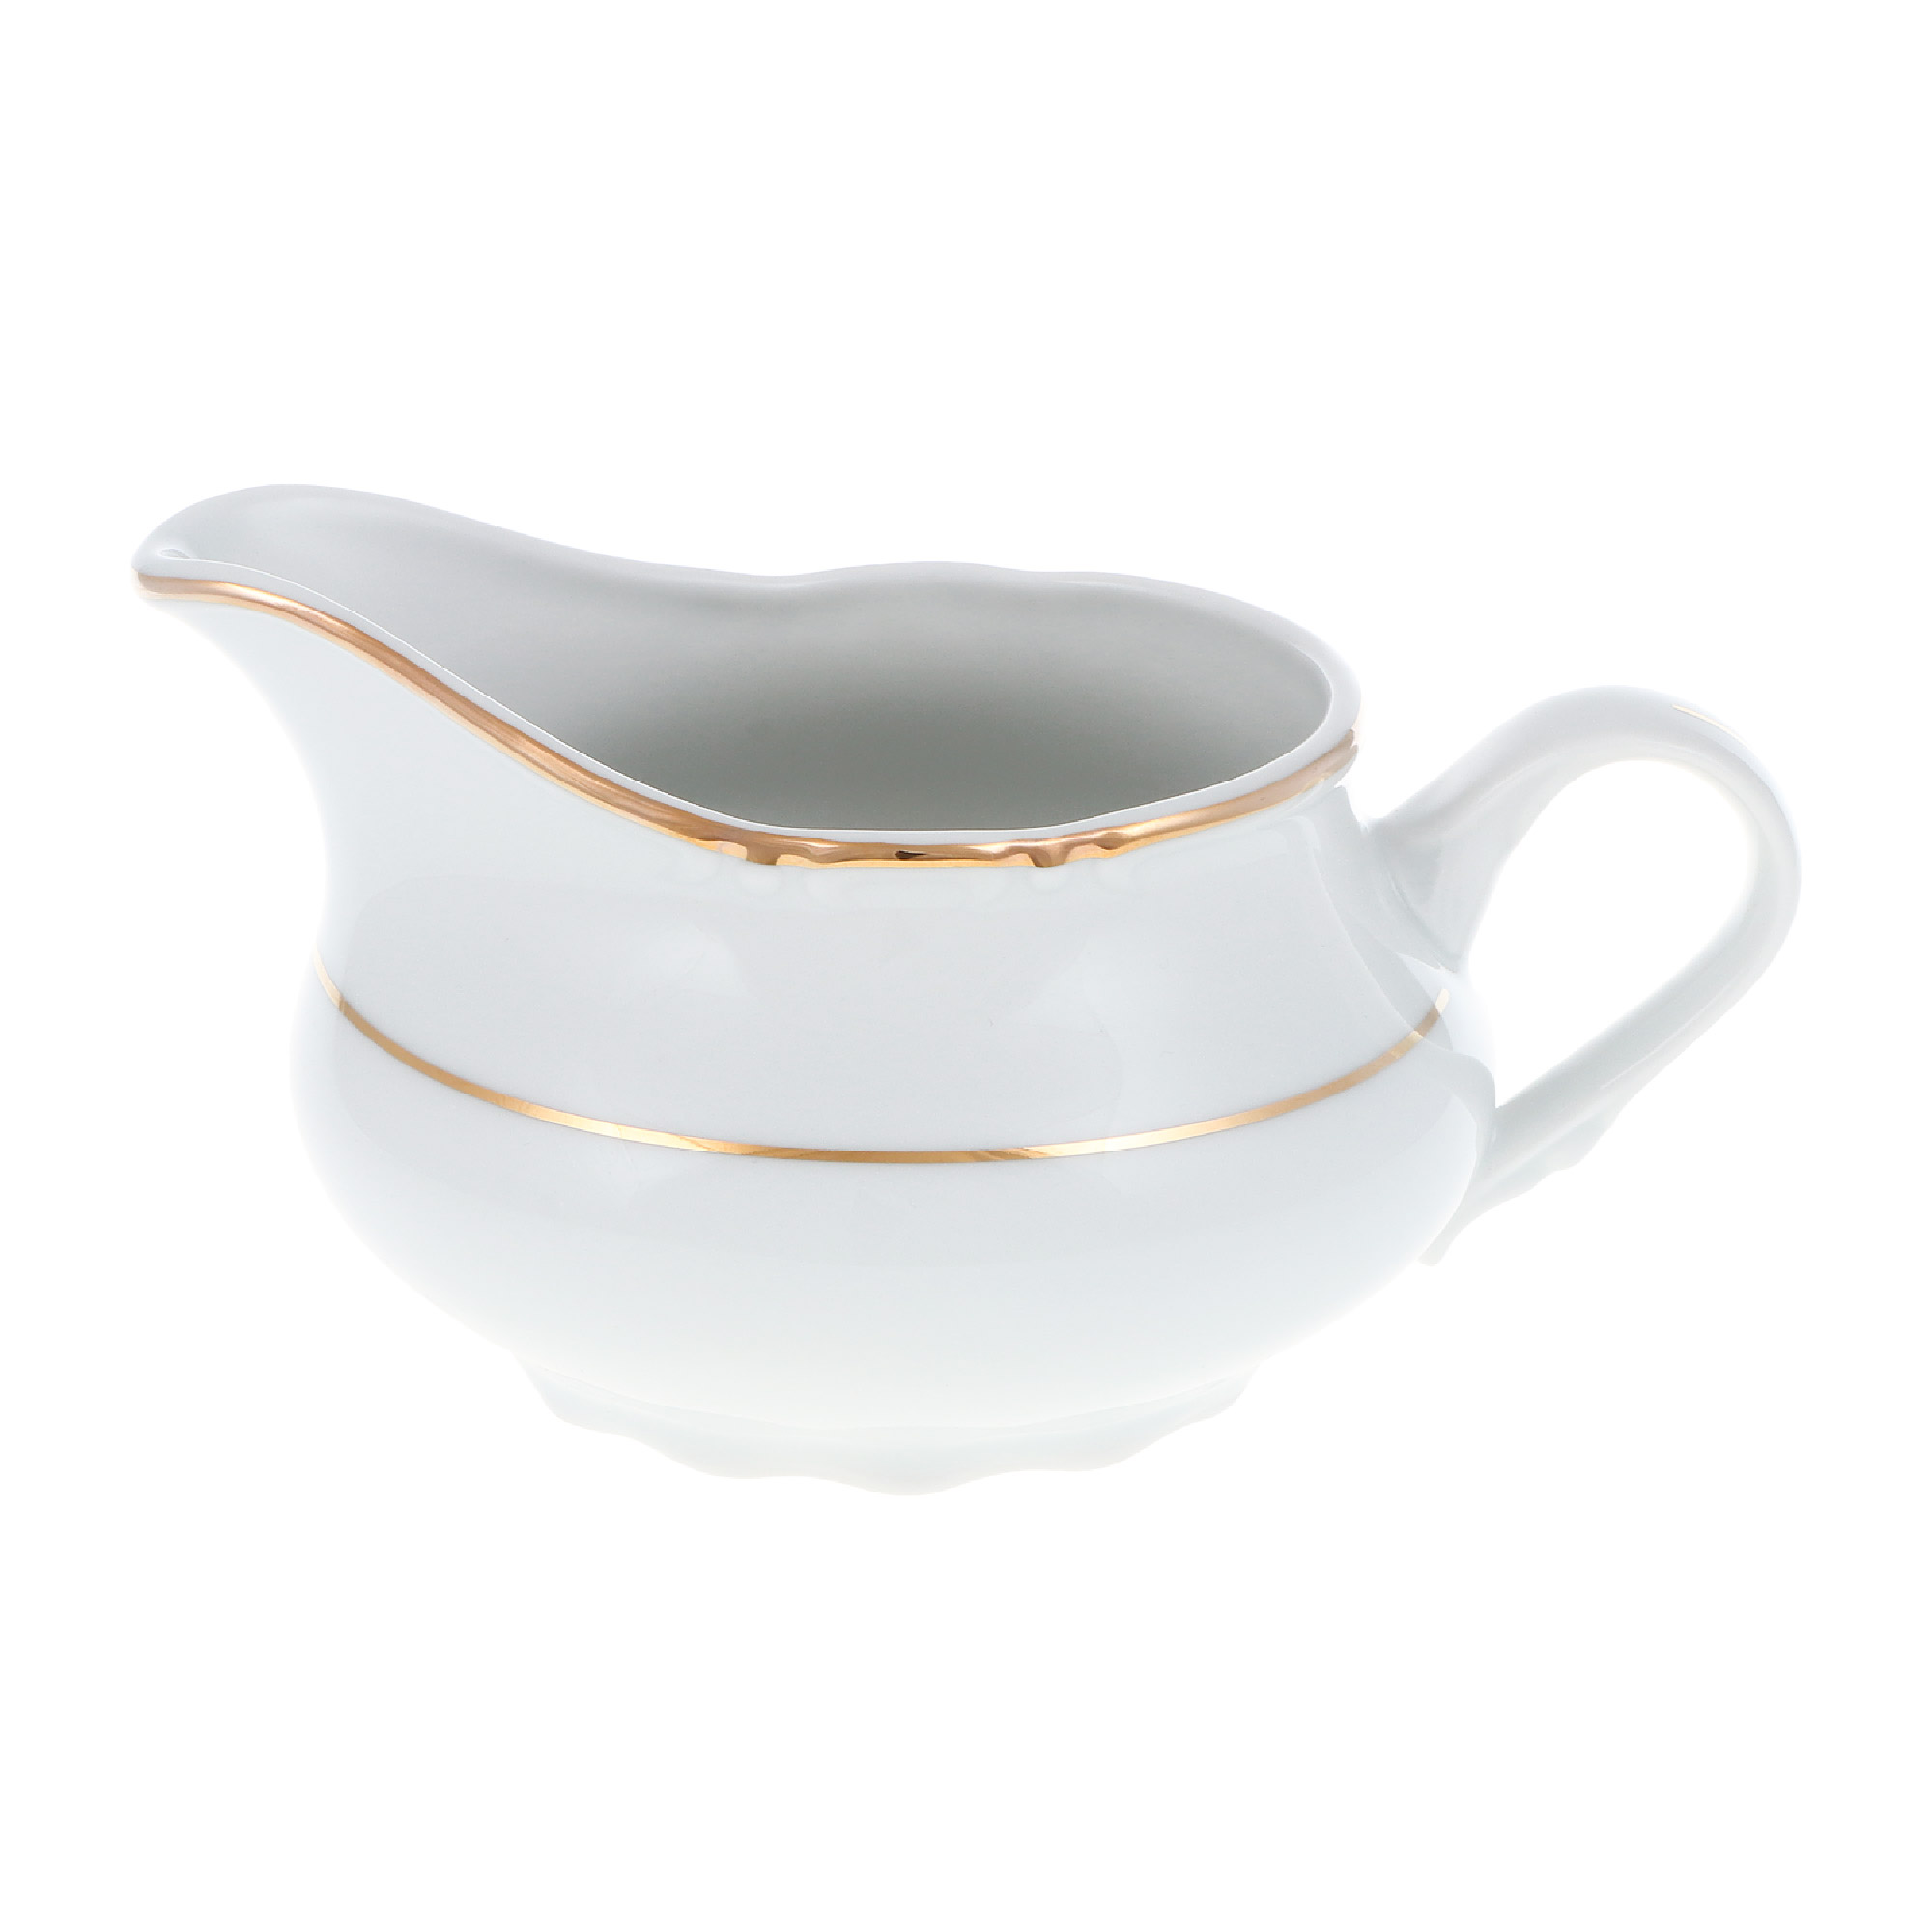 Молочник низкий 350 мл Thun1794 декор отводка золото фото